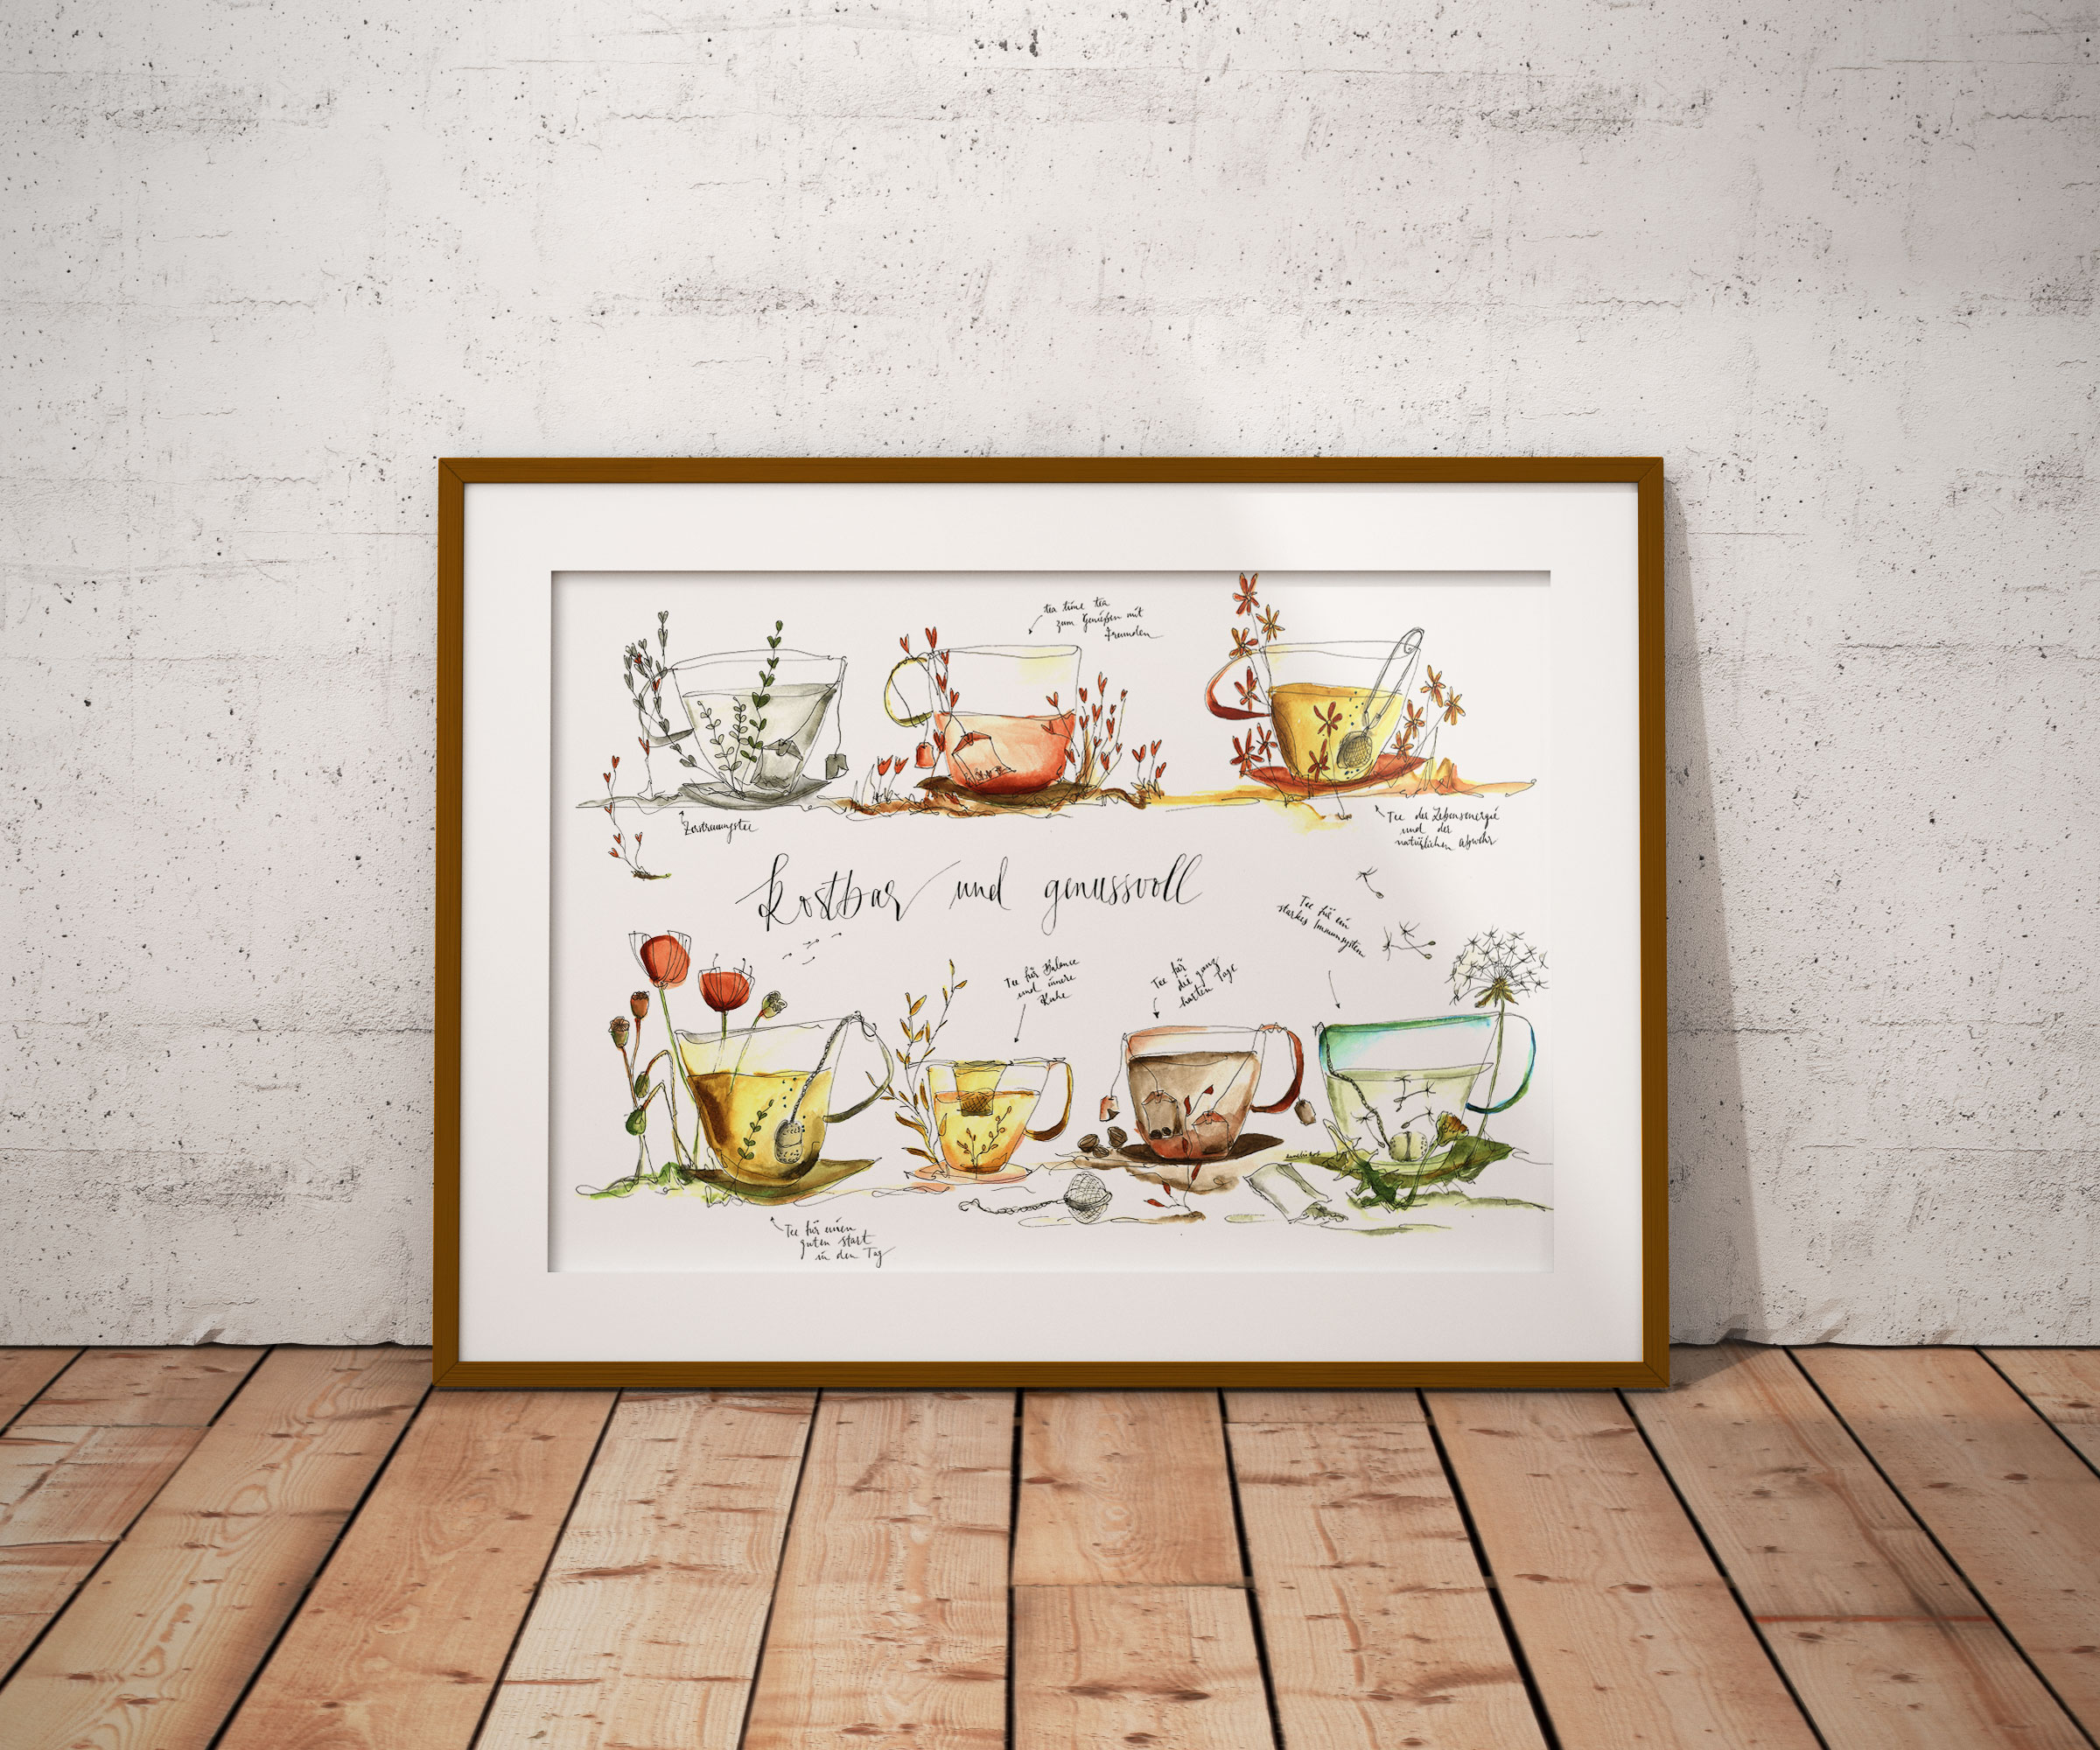 Wandbild für Teeliebhaber - Teeselektion